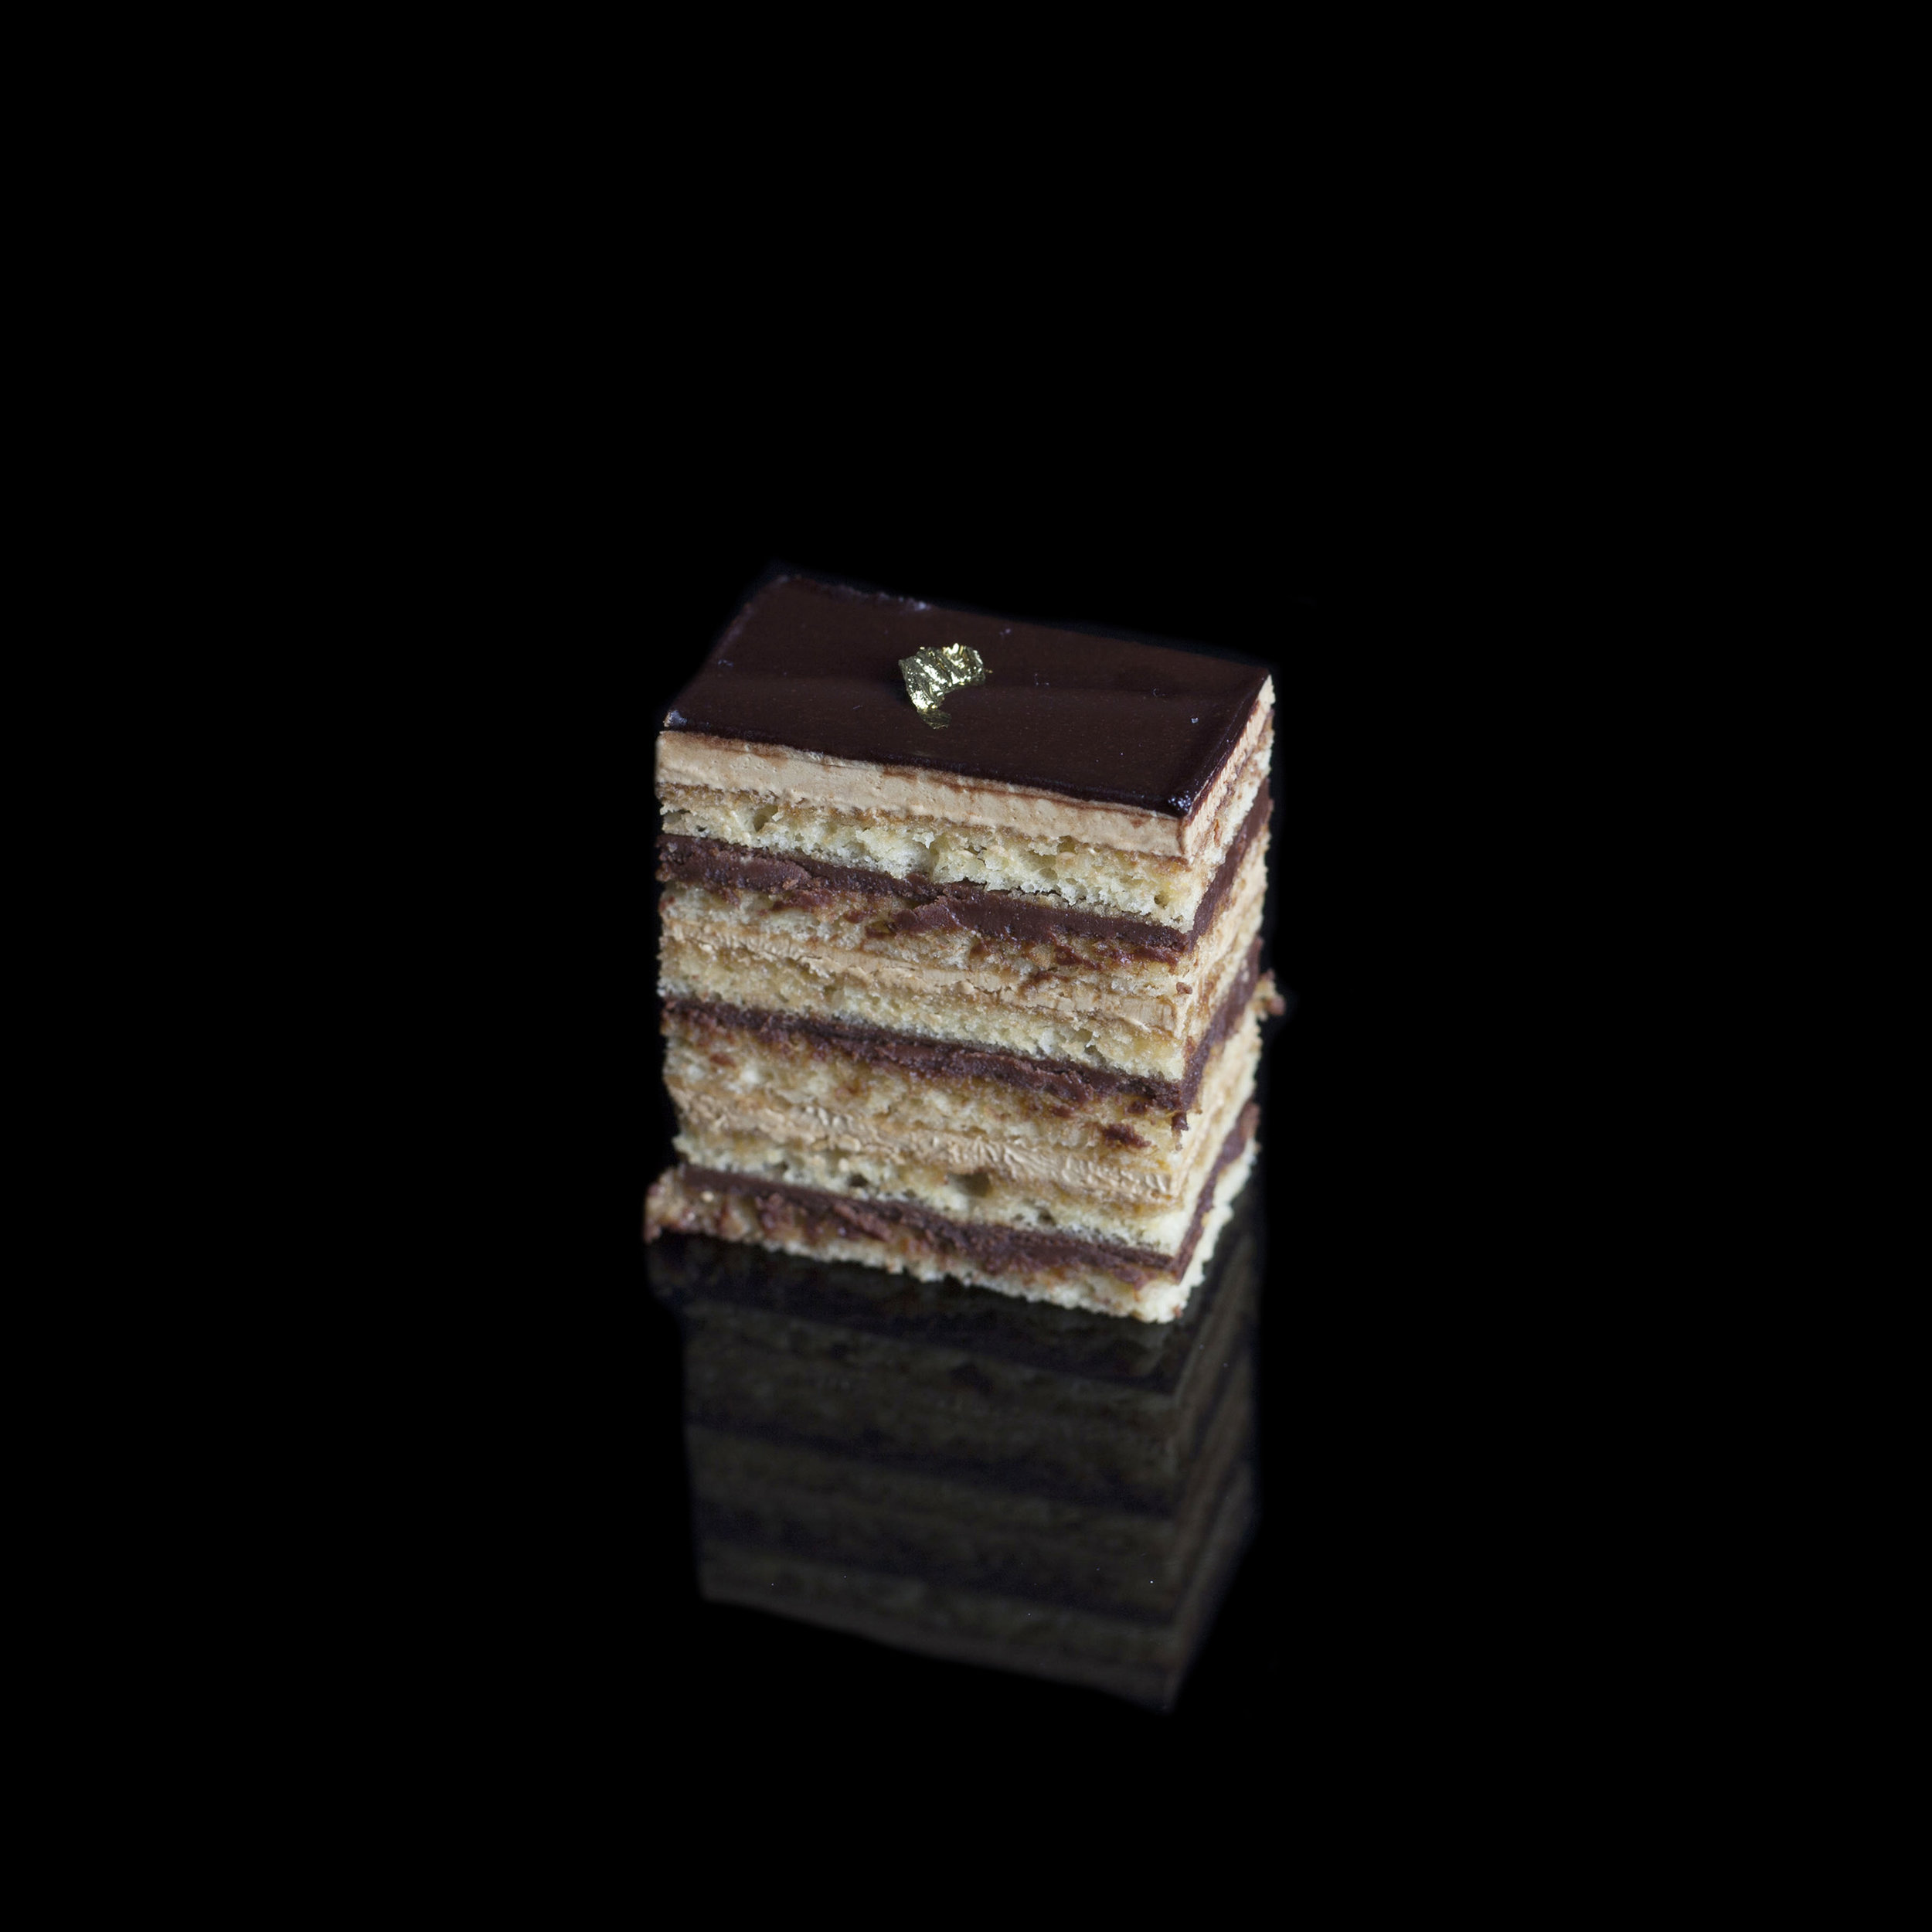 Opera Cake (Chocolate & Coffee)